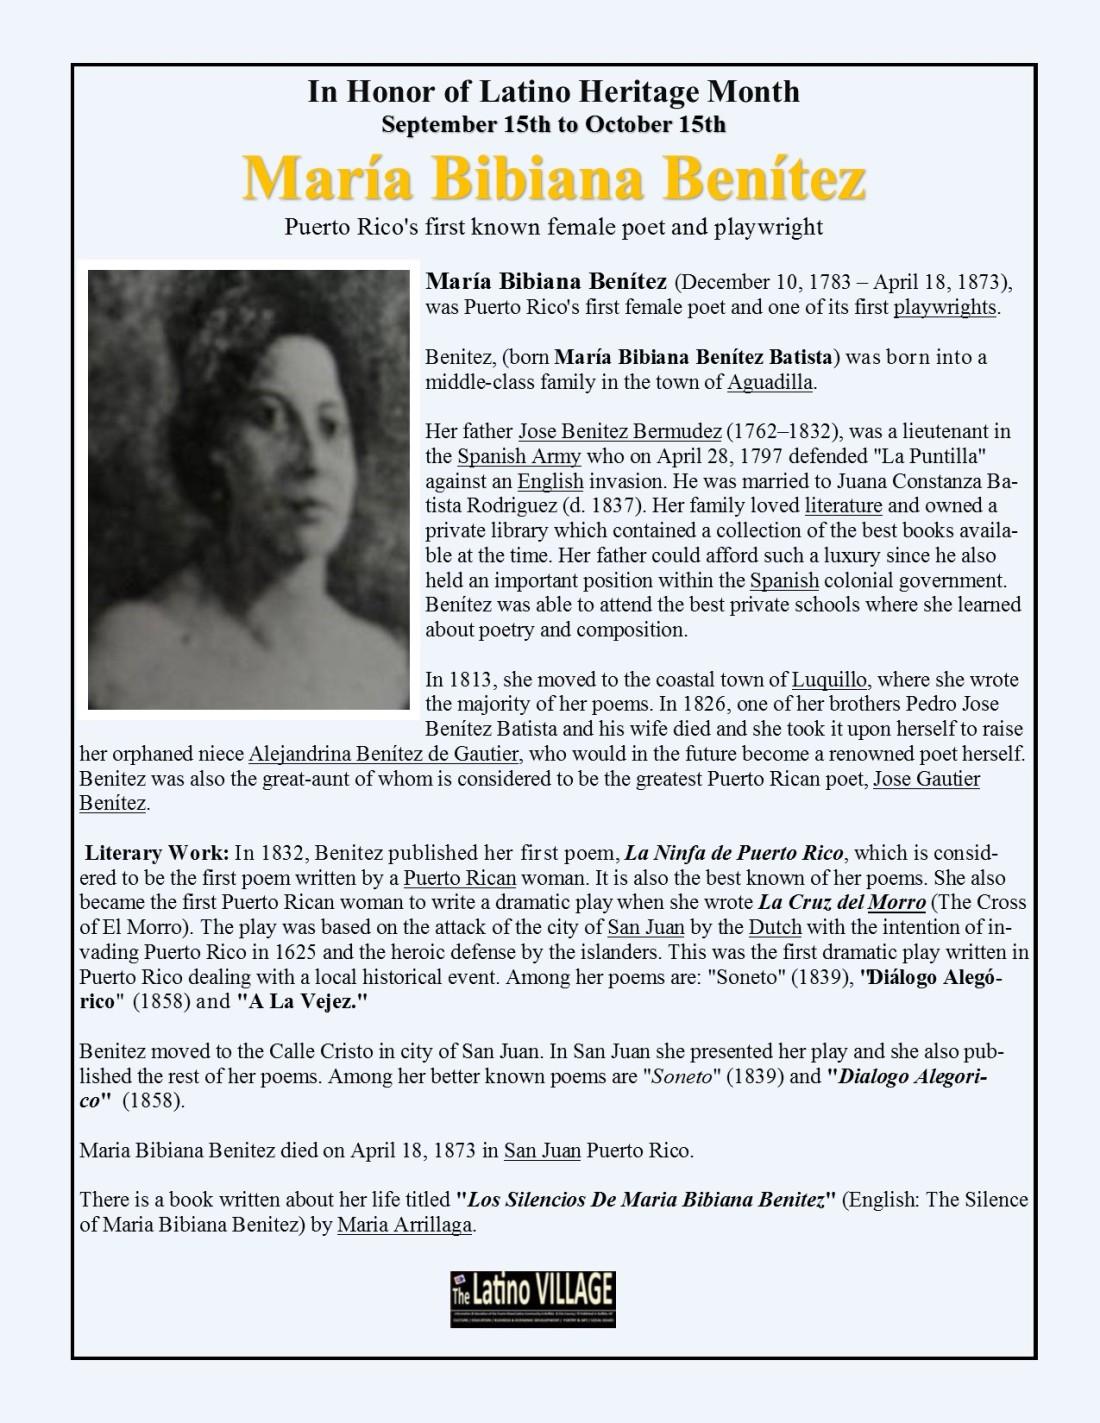 María Bibiana Benítez